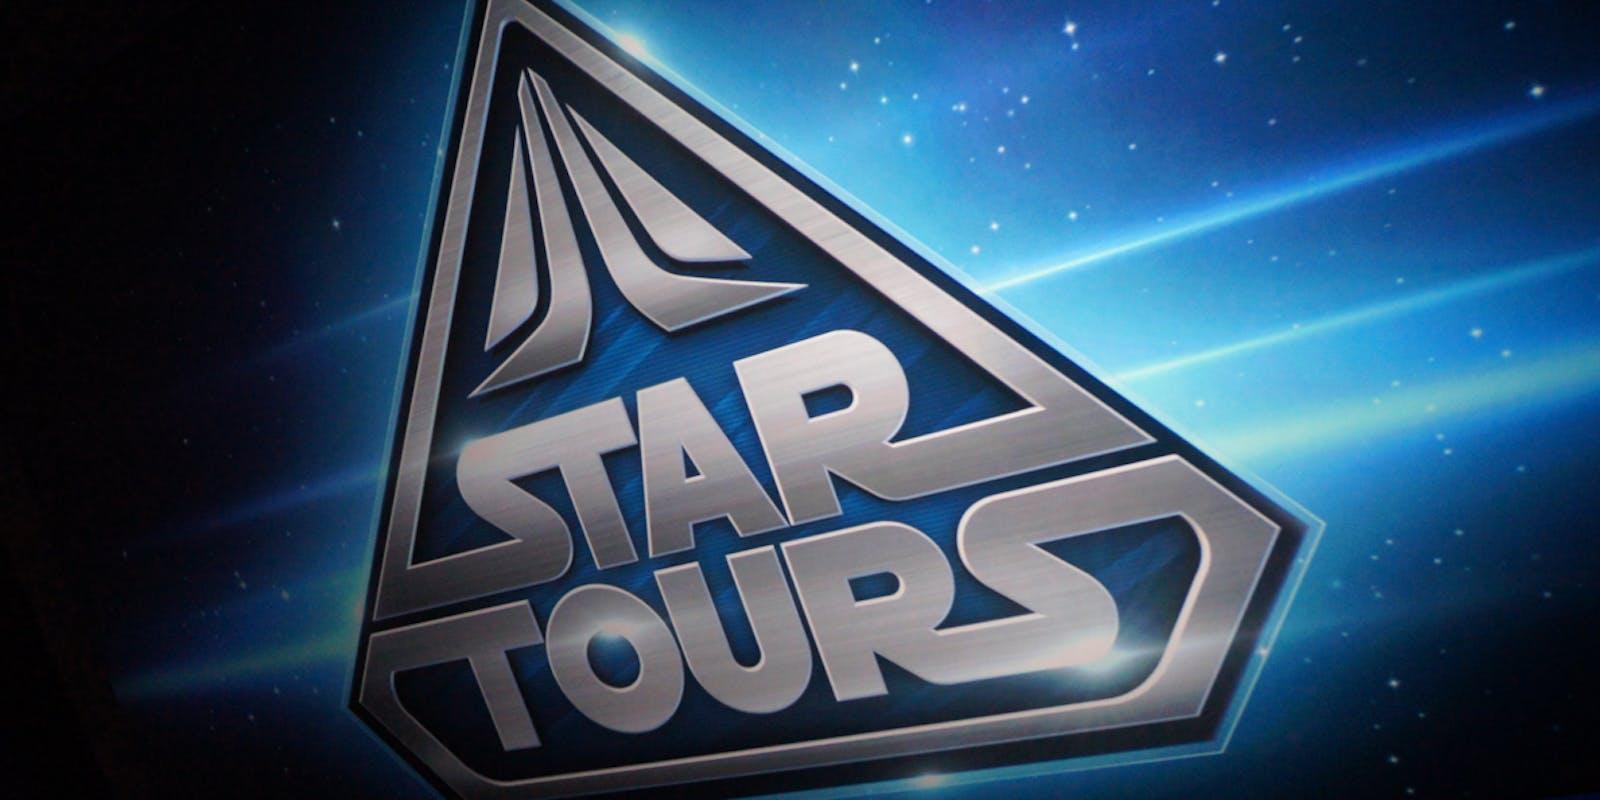 Voyage au coeur de Tokyo Disneyland : Fantasyland, Toontown, Tomorrowland